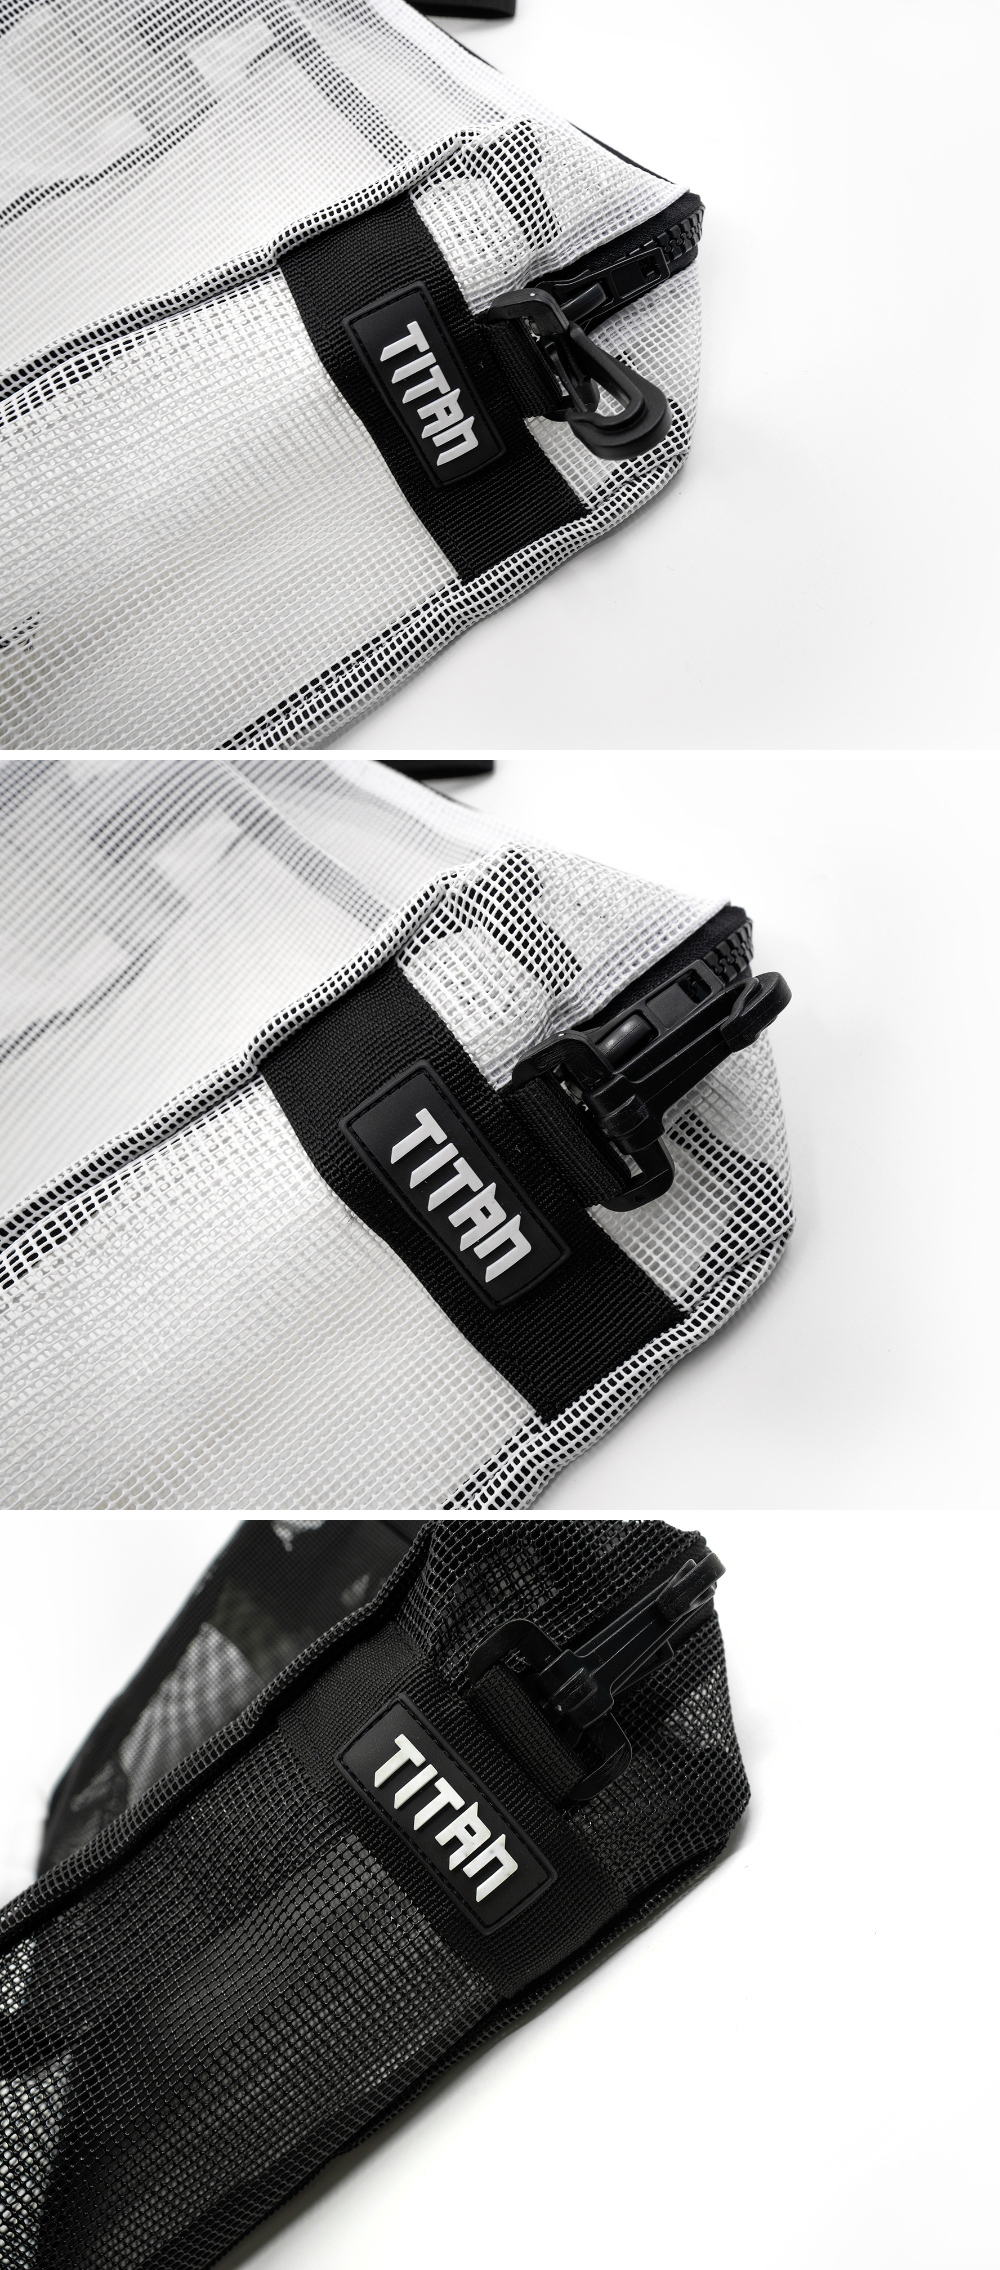 bag detail image-S1L12